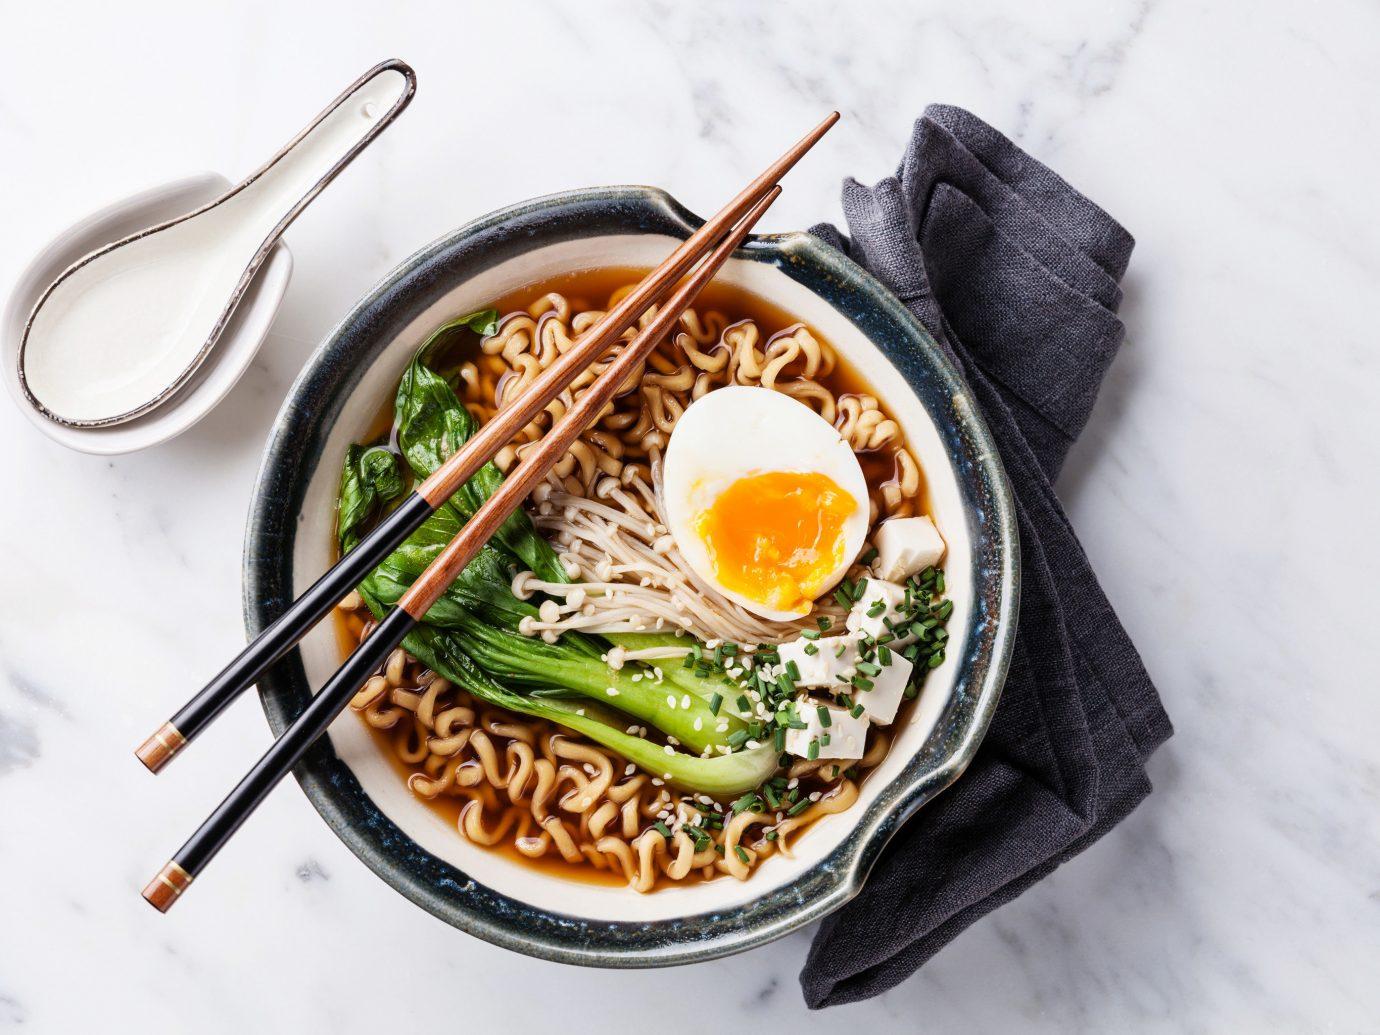 Food + Drink dish food cuisine meal asian food produce vegetable